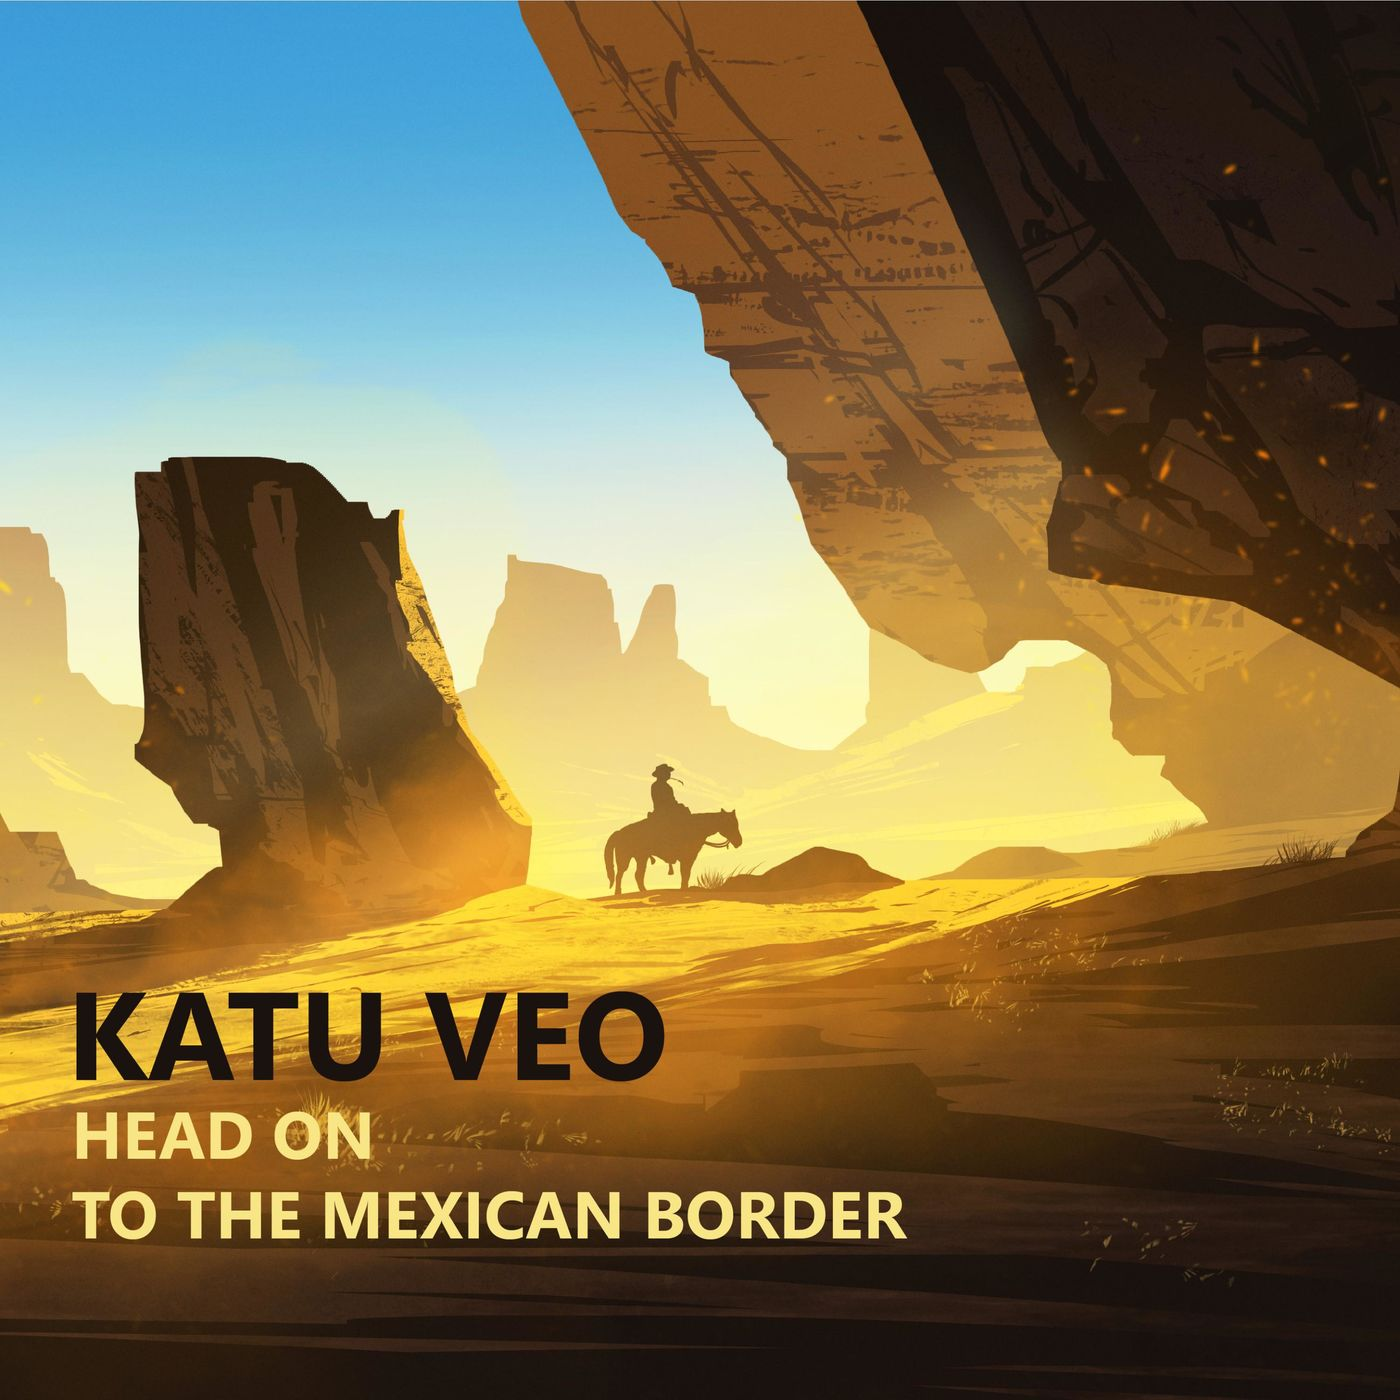 Katu Veo - Head On to the Mexican Border [single] (2019)